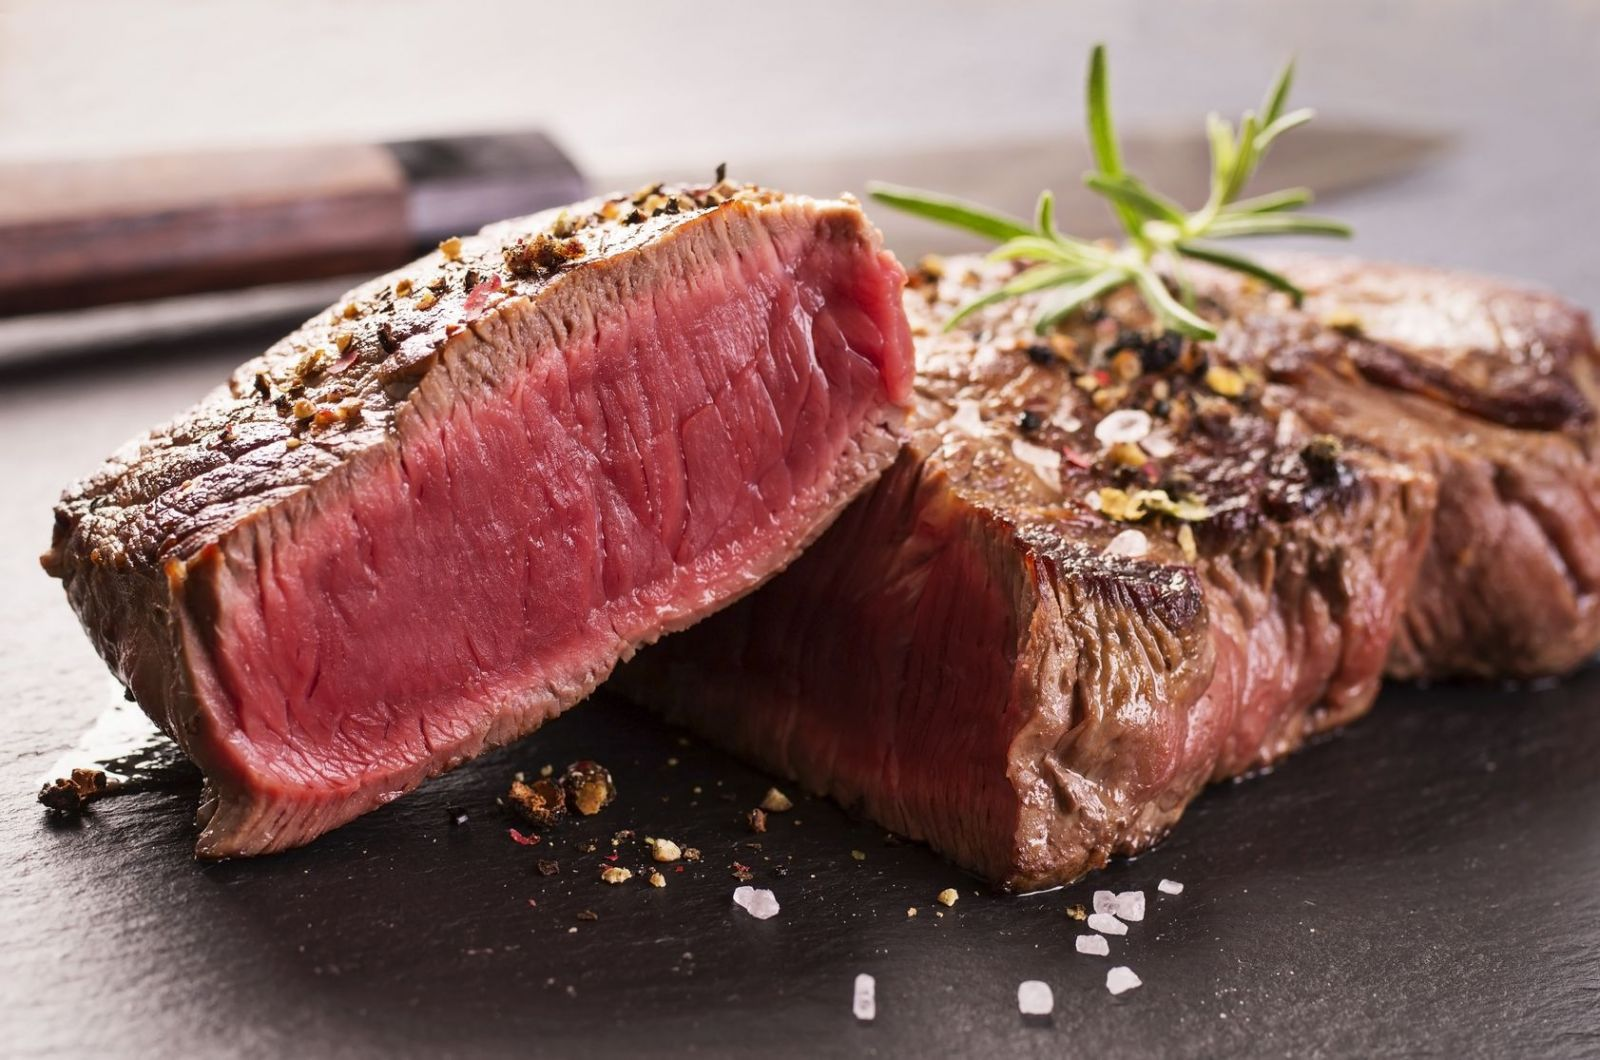 похудела без мяса